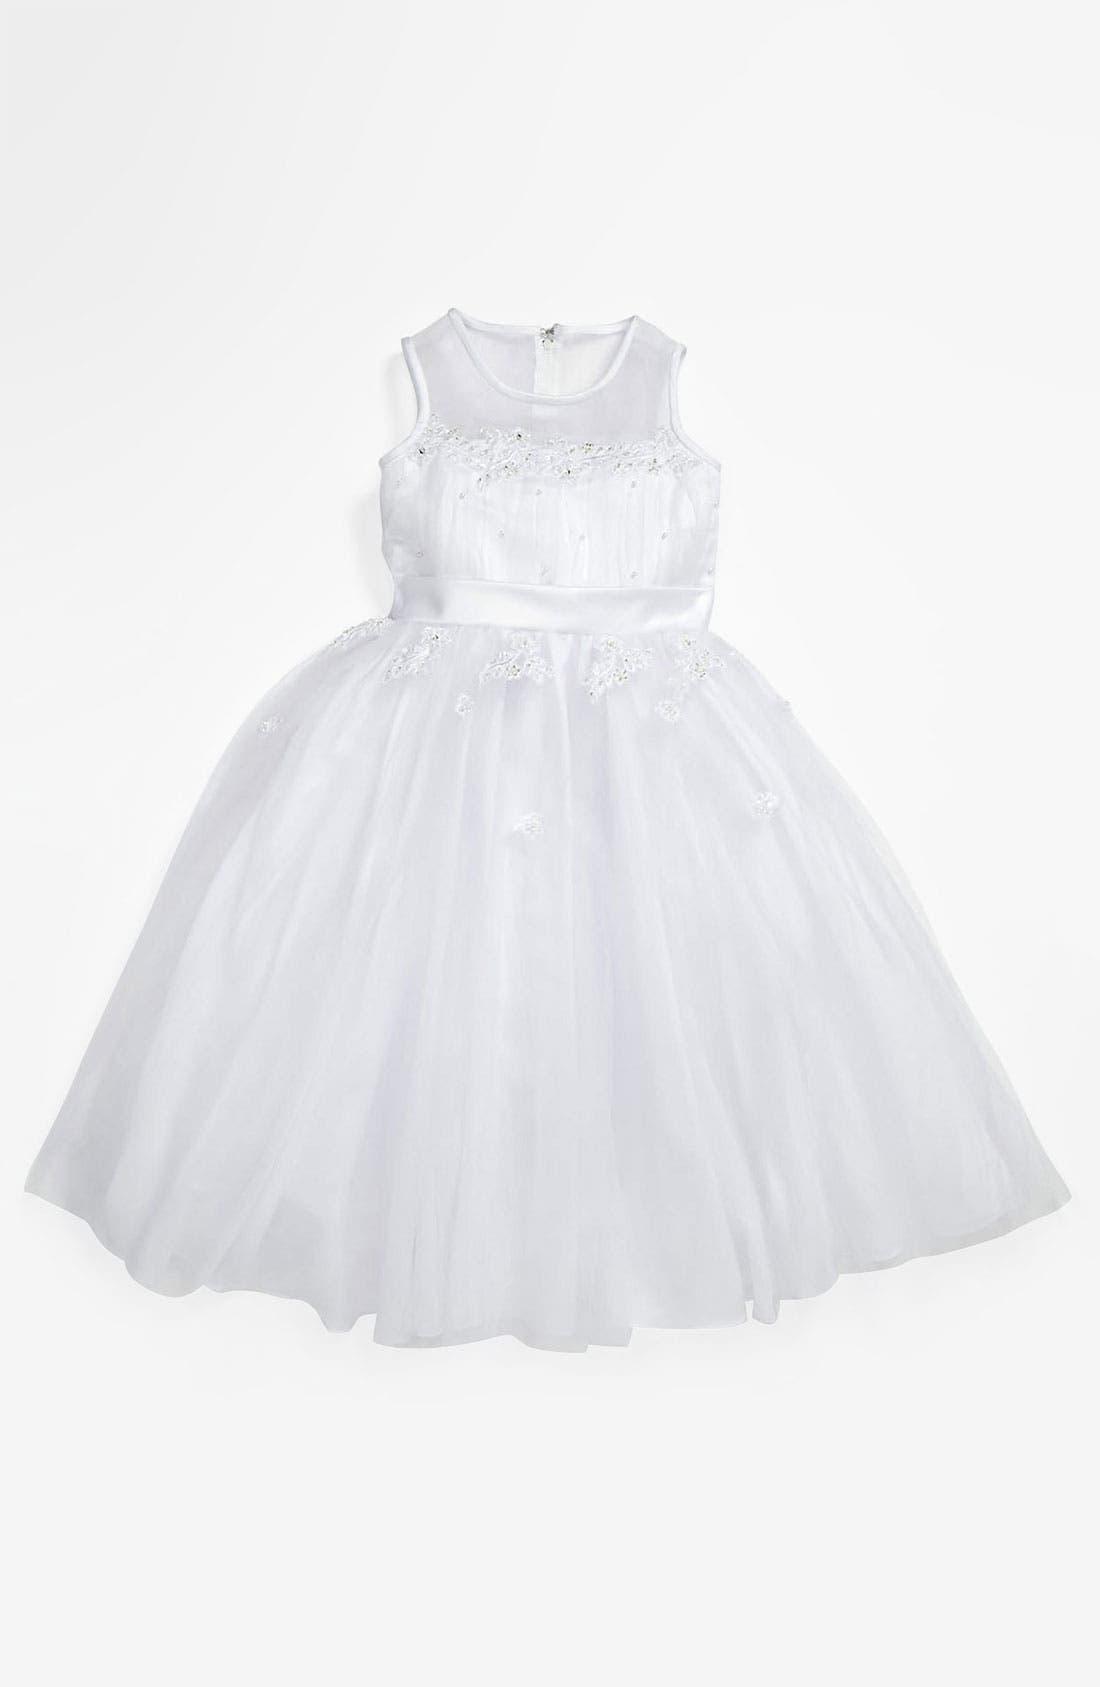 Main Image - Lauren Marie Illusion Top Gown (Little Girls & Big Girls)